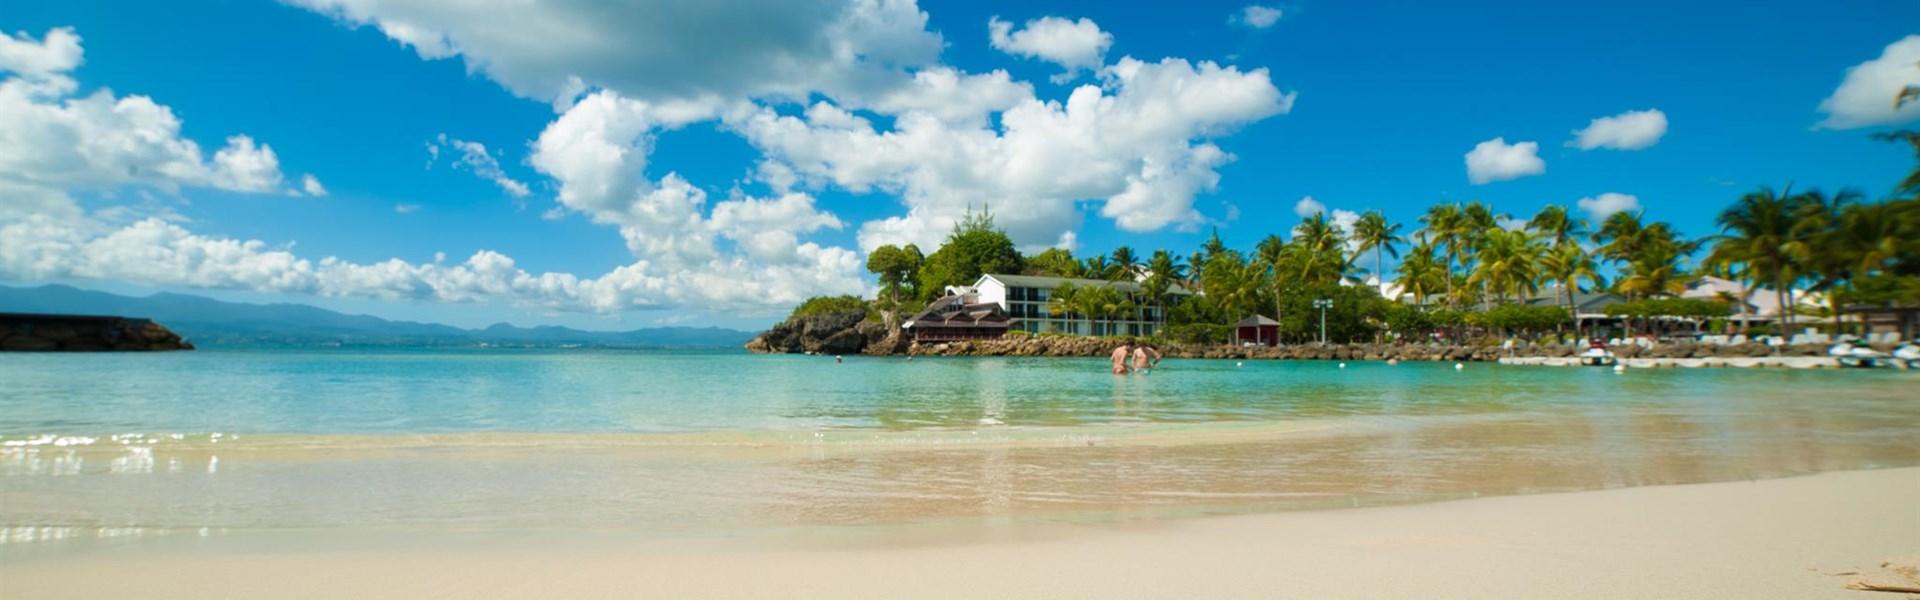 Marco Polo - La Creole Beach hotel and Spa -